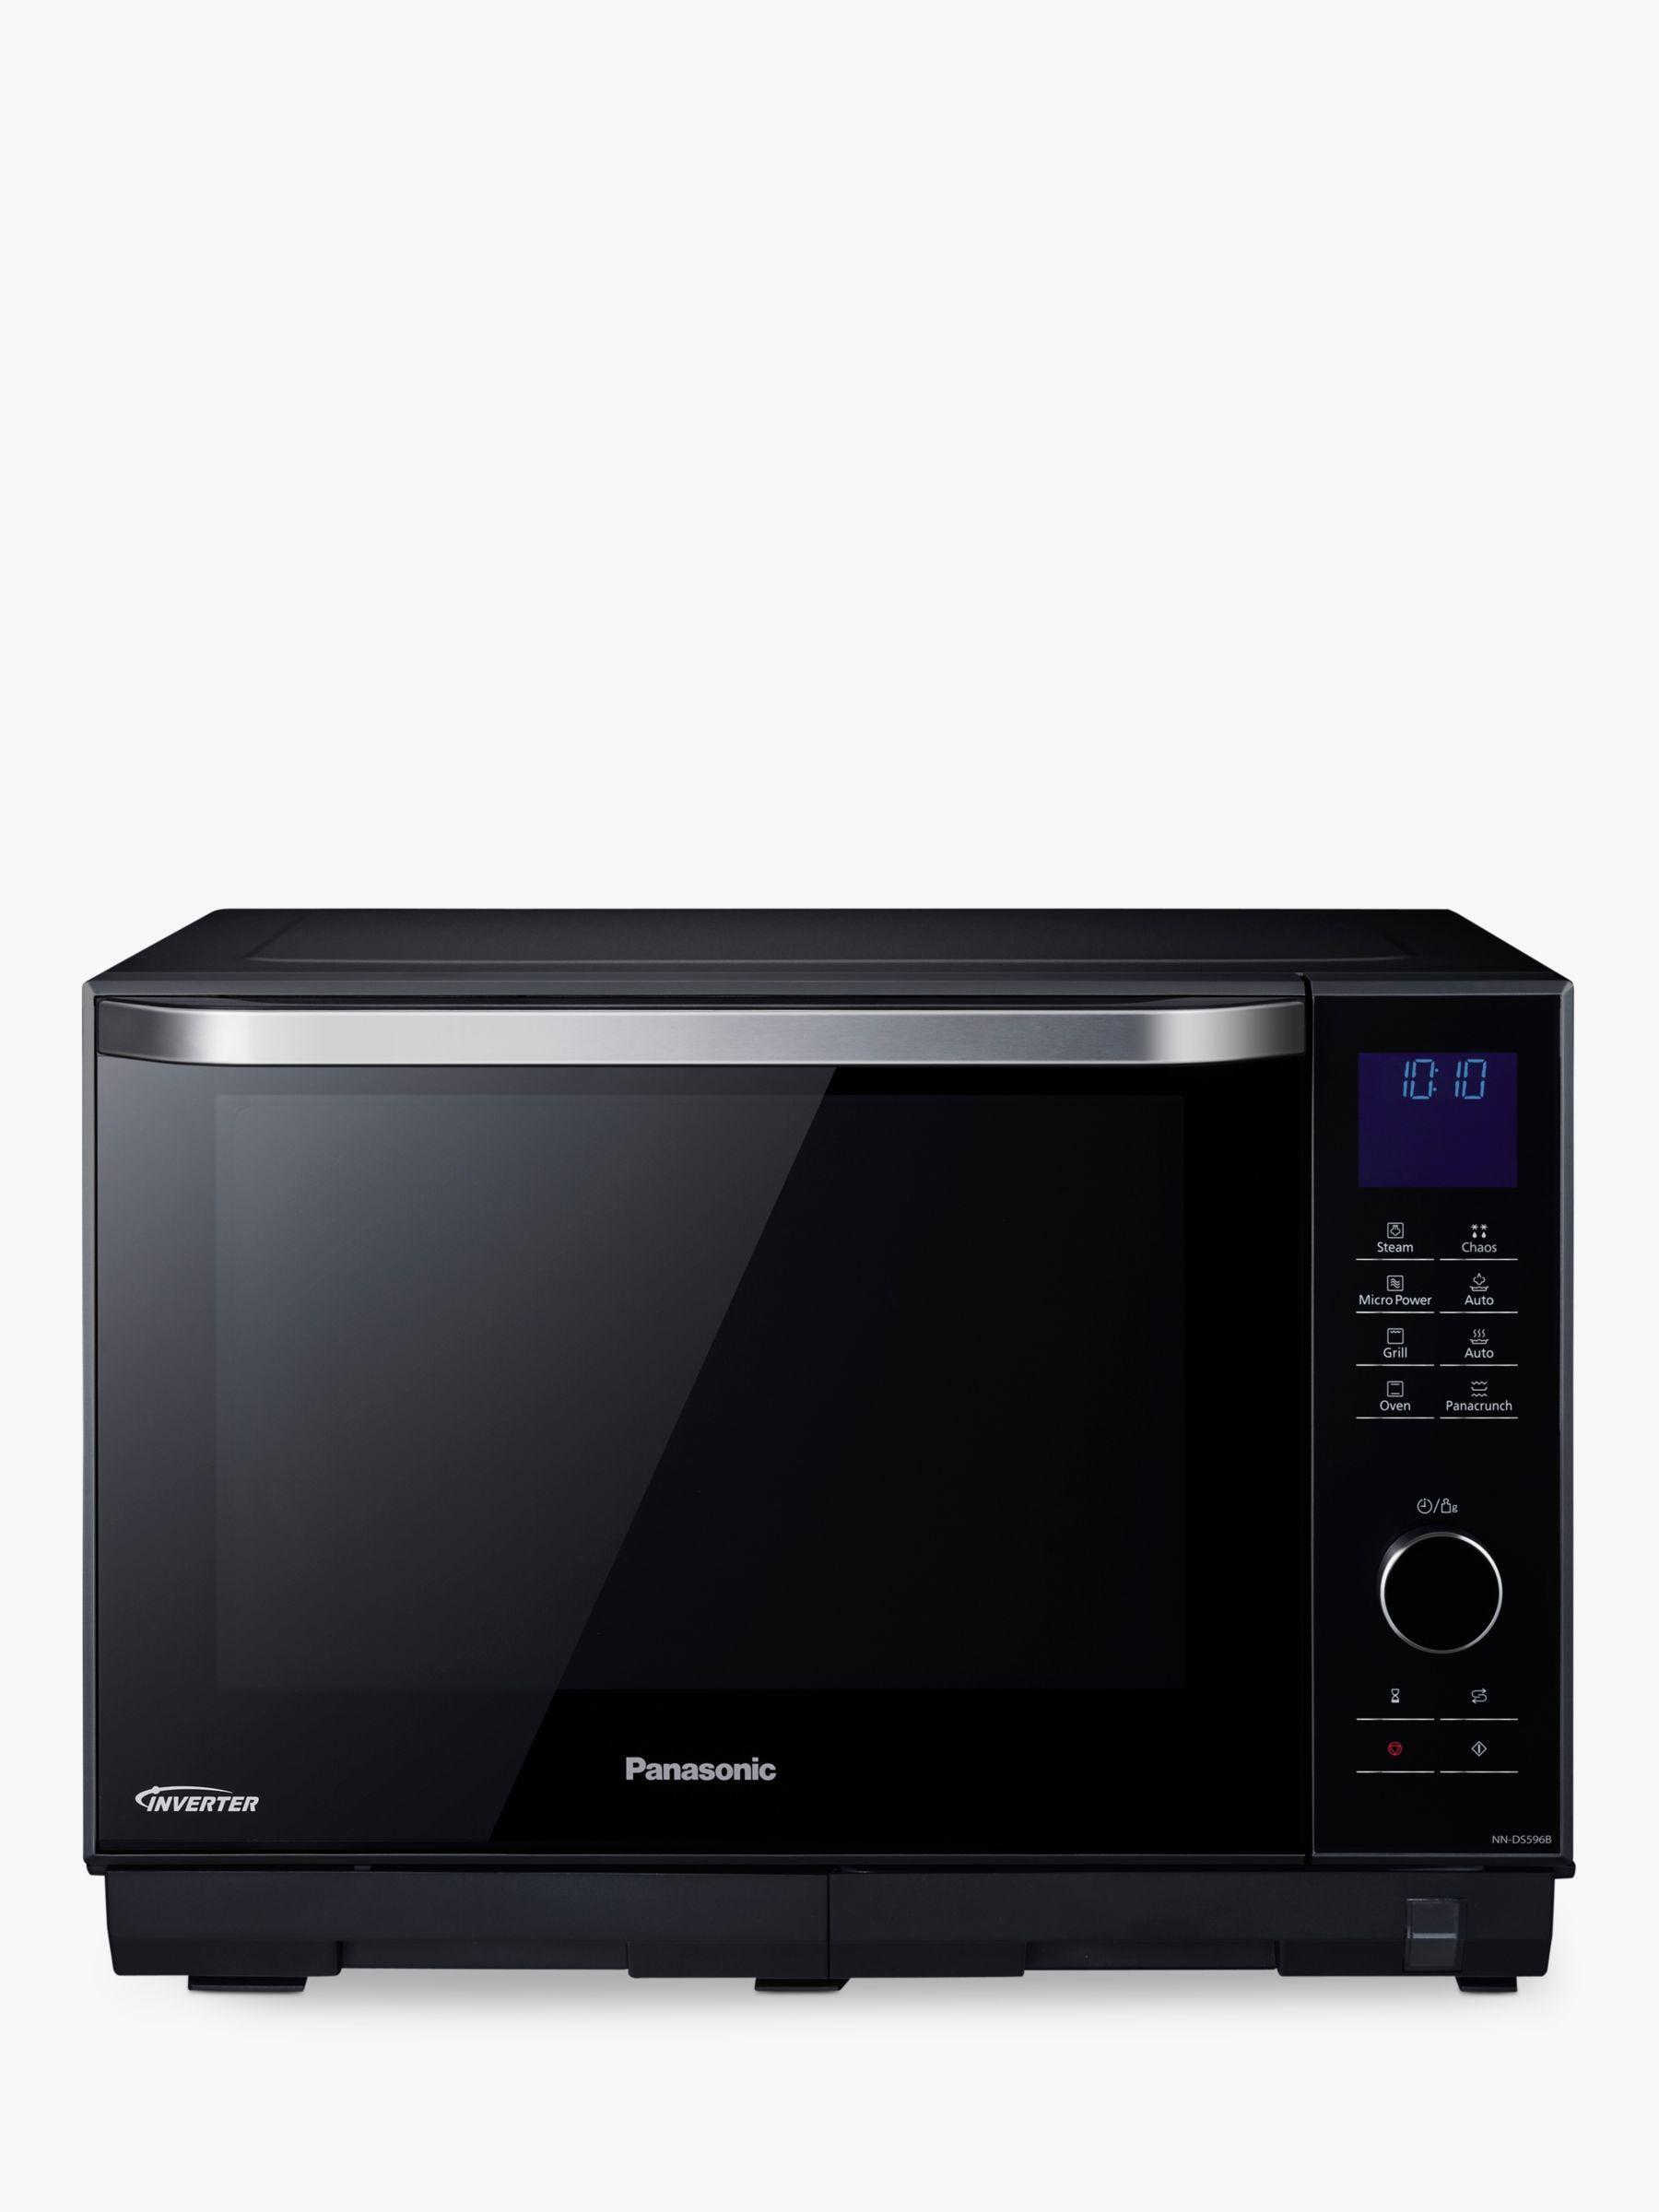 Steam Combination Microwave OvenBestMicrowave